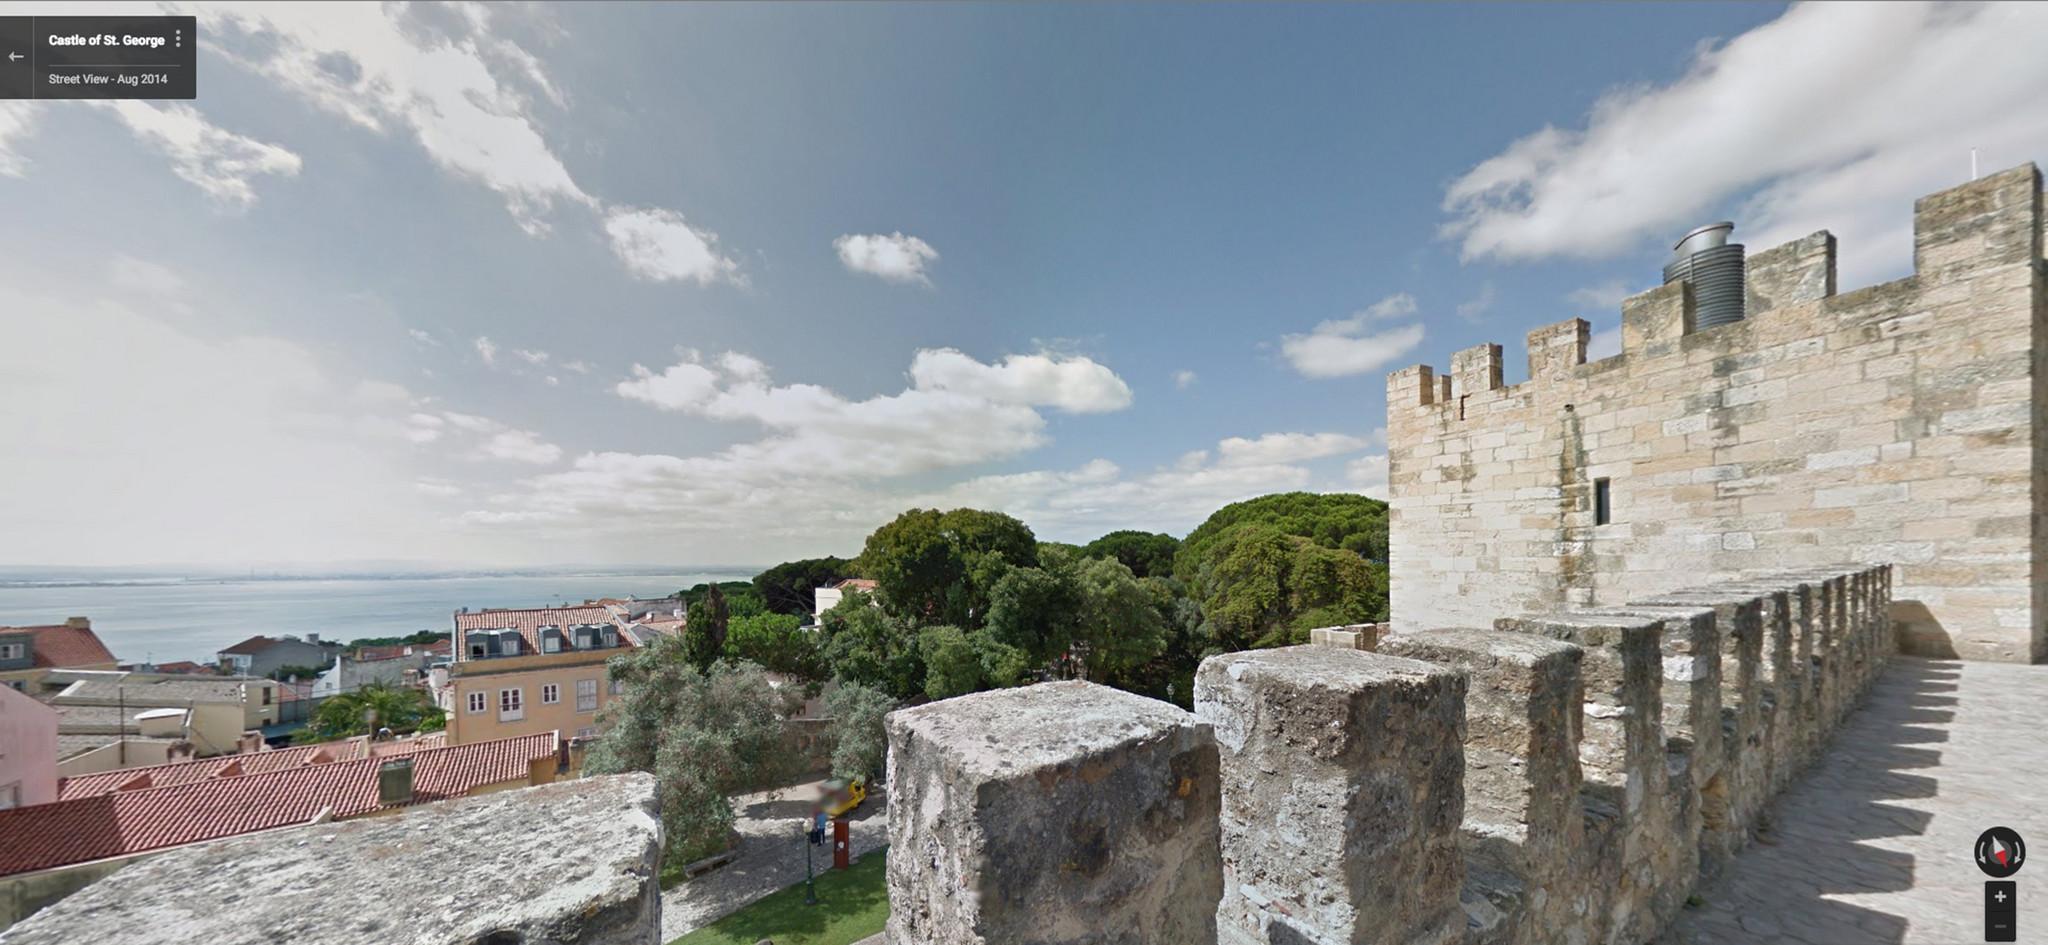 Castelo de S. Jorge2.jpg